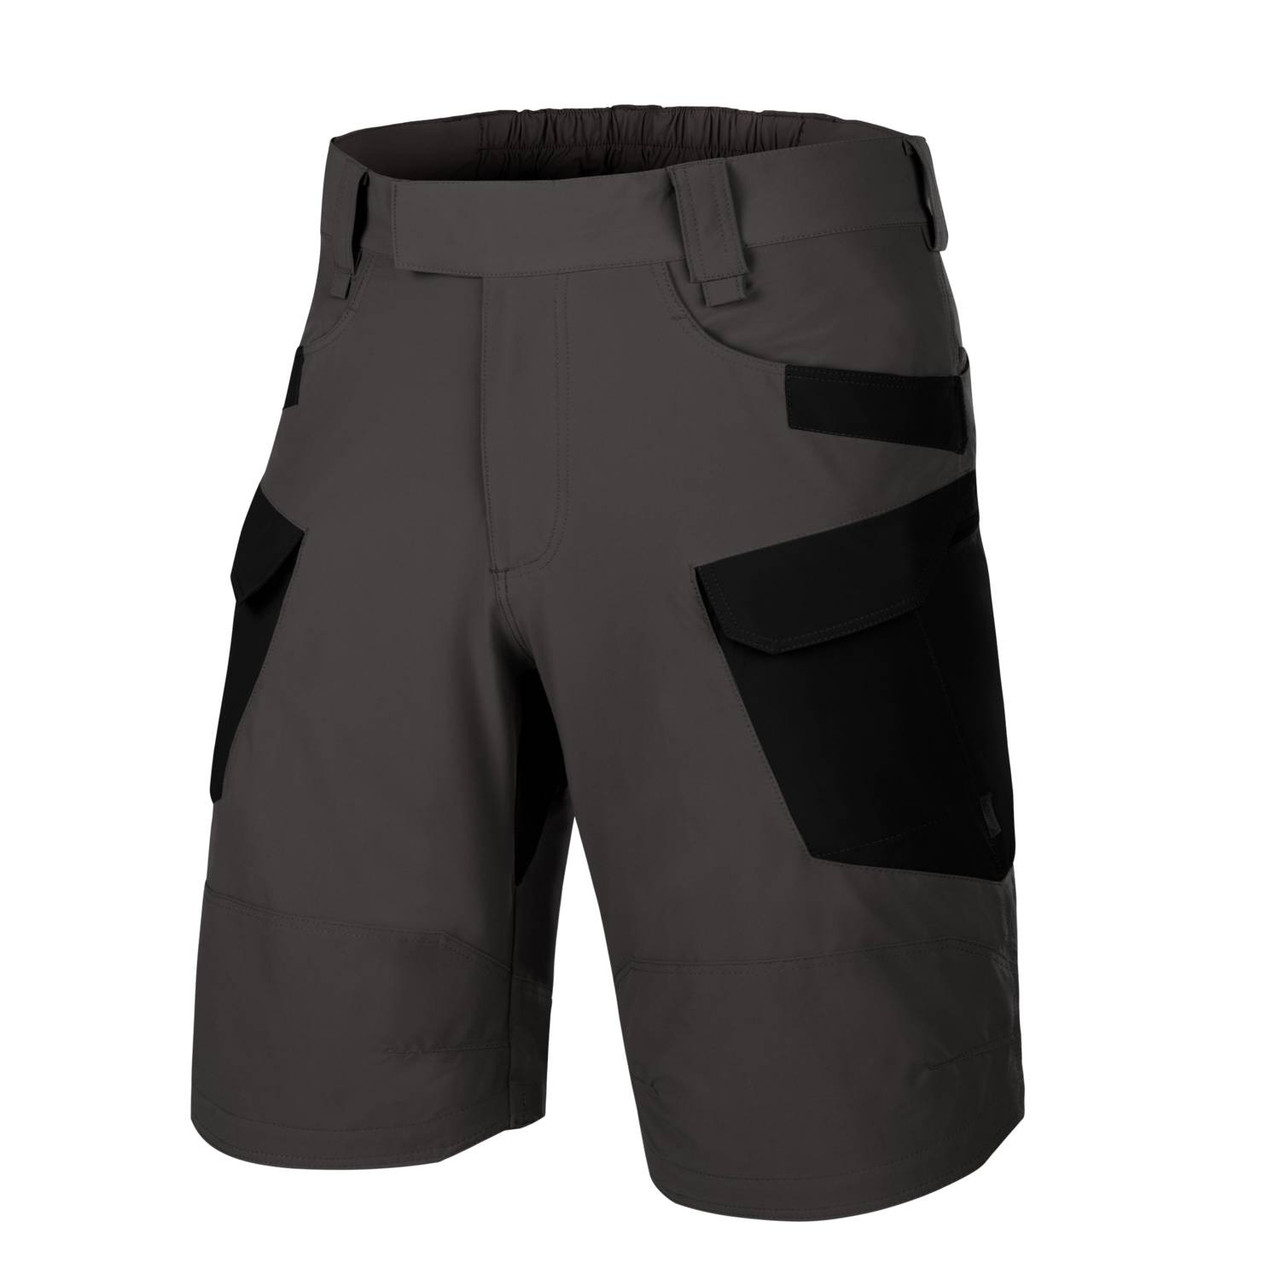 "Шорты Helikon-Tex® OTS (Outdoor Tactical Shorts) 11""® - VersaStrecth® Lite - Ash Grey/Black"